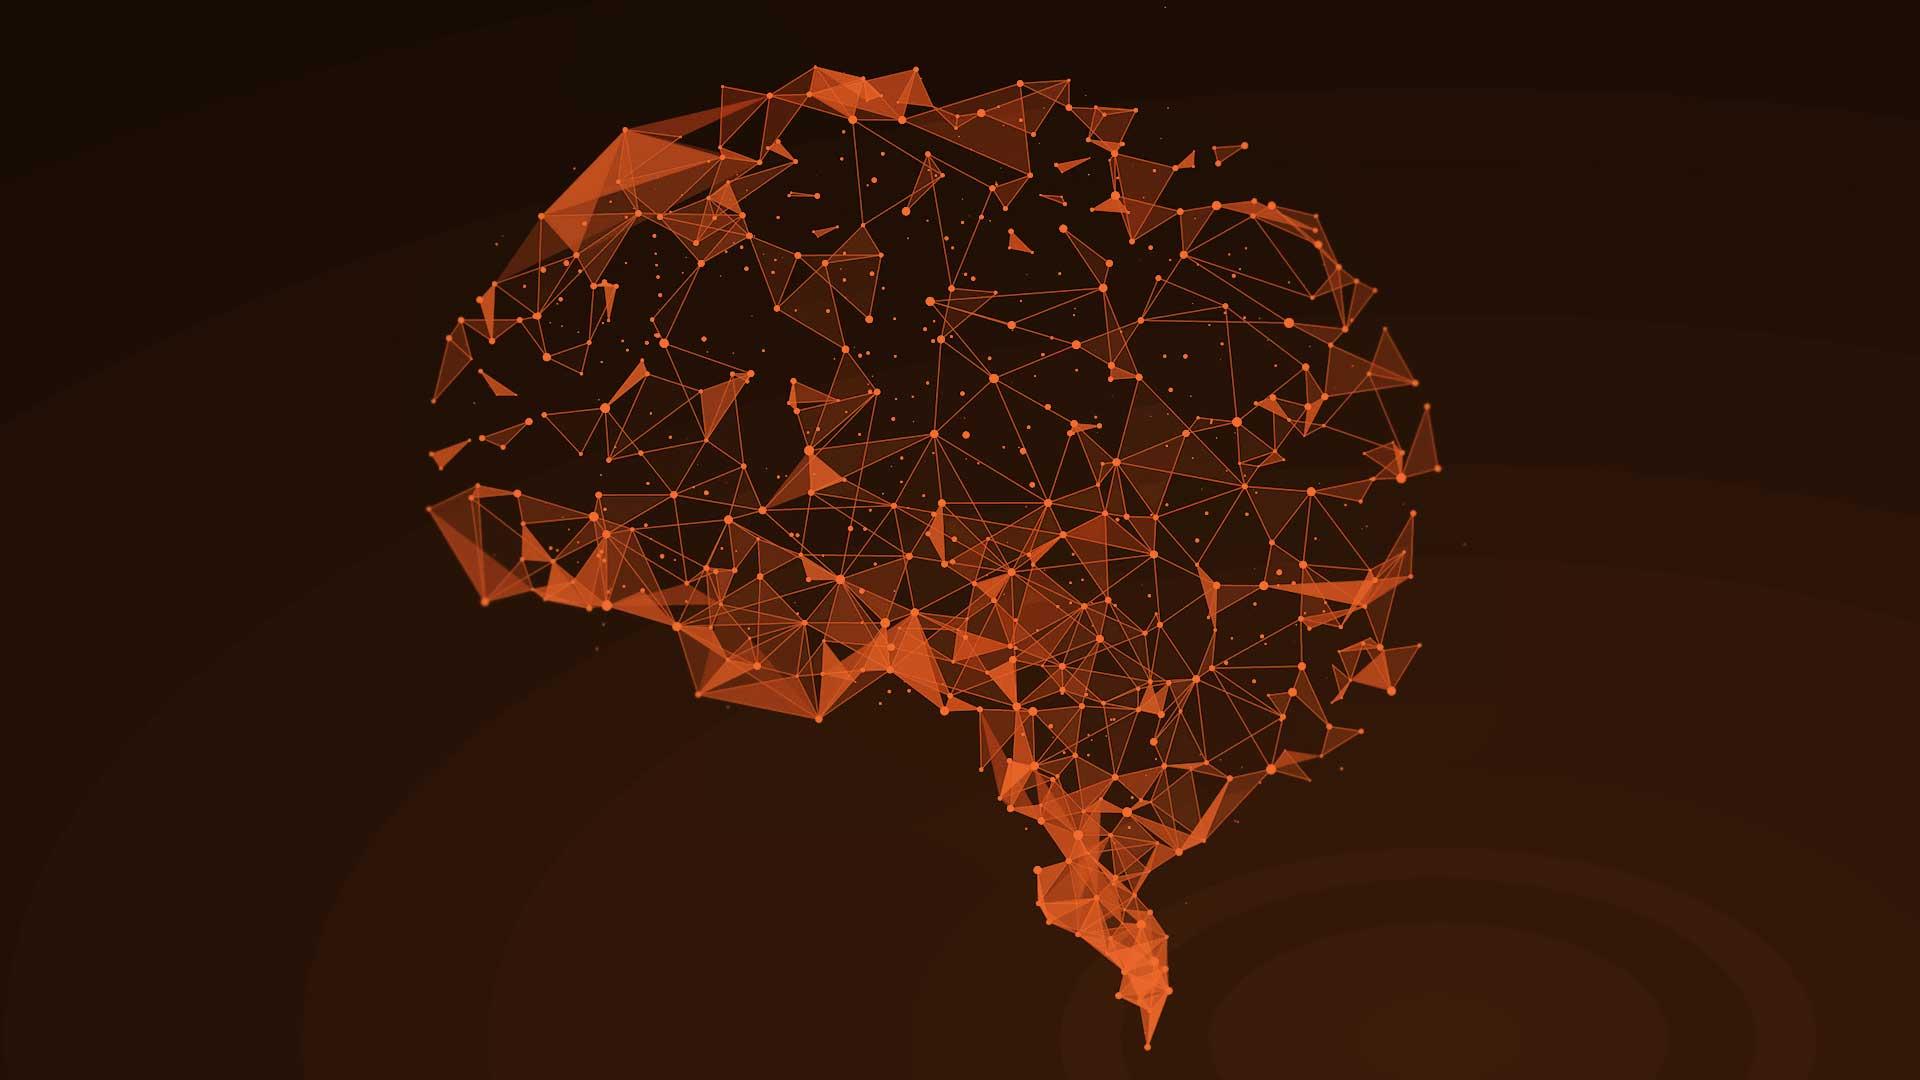 Geometric brain illustration